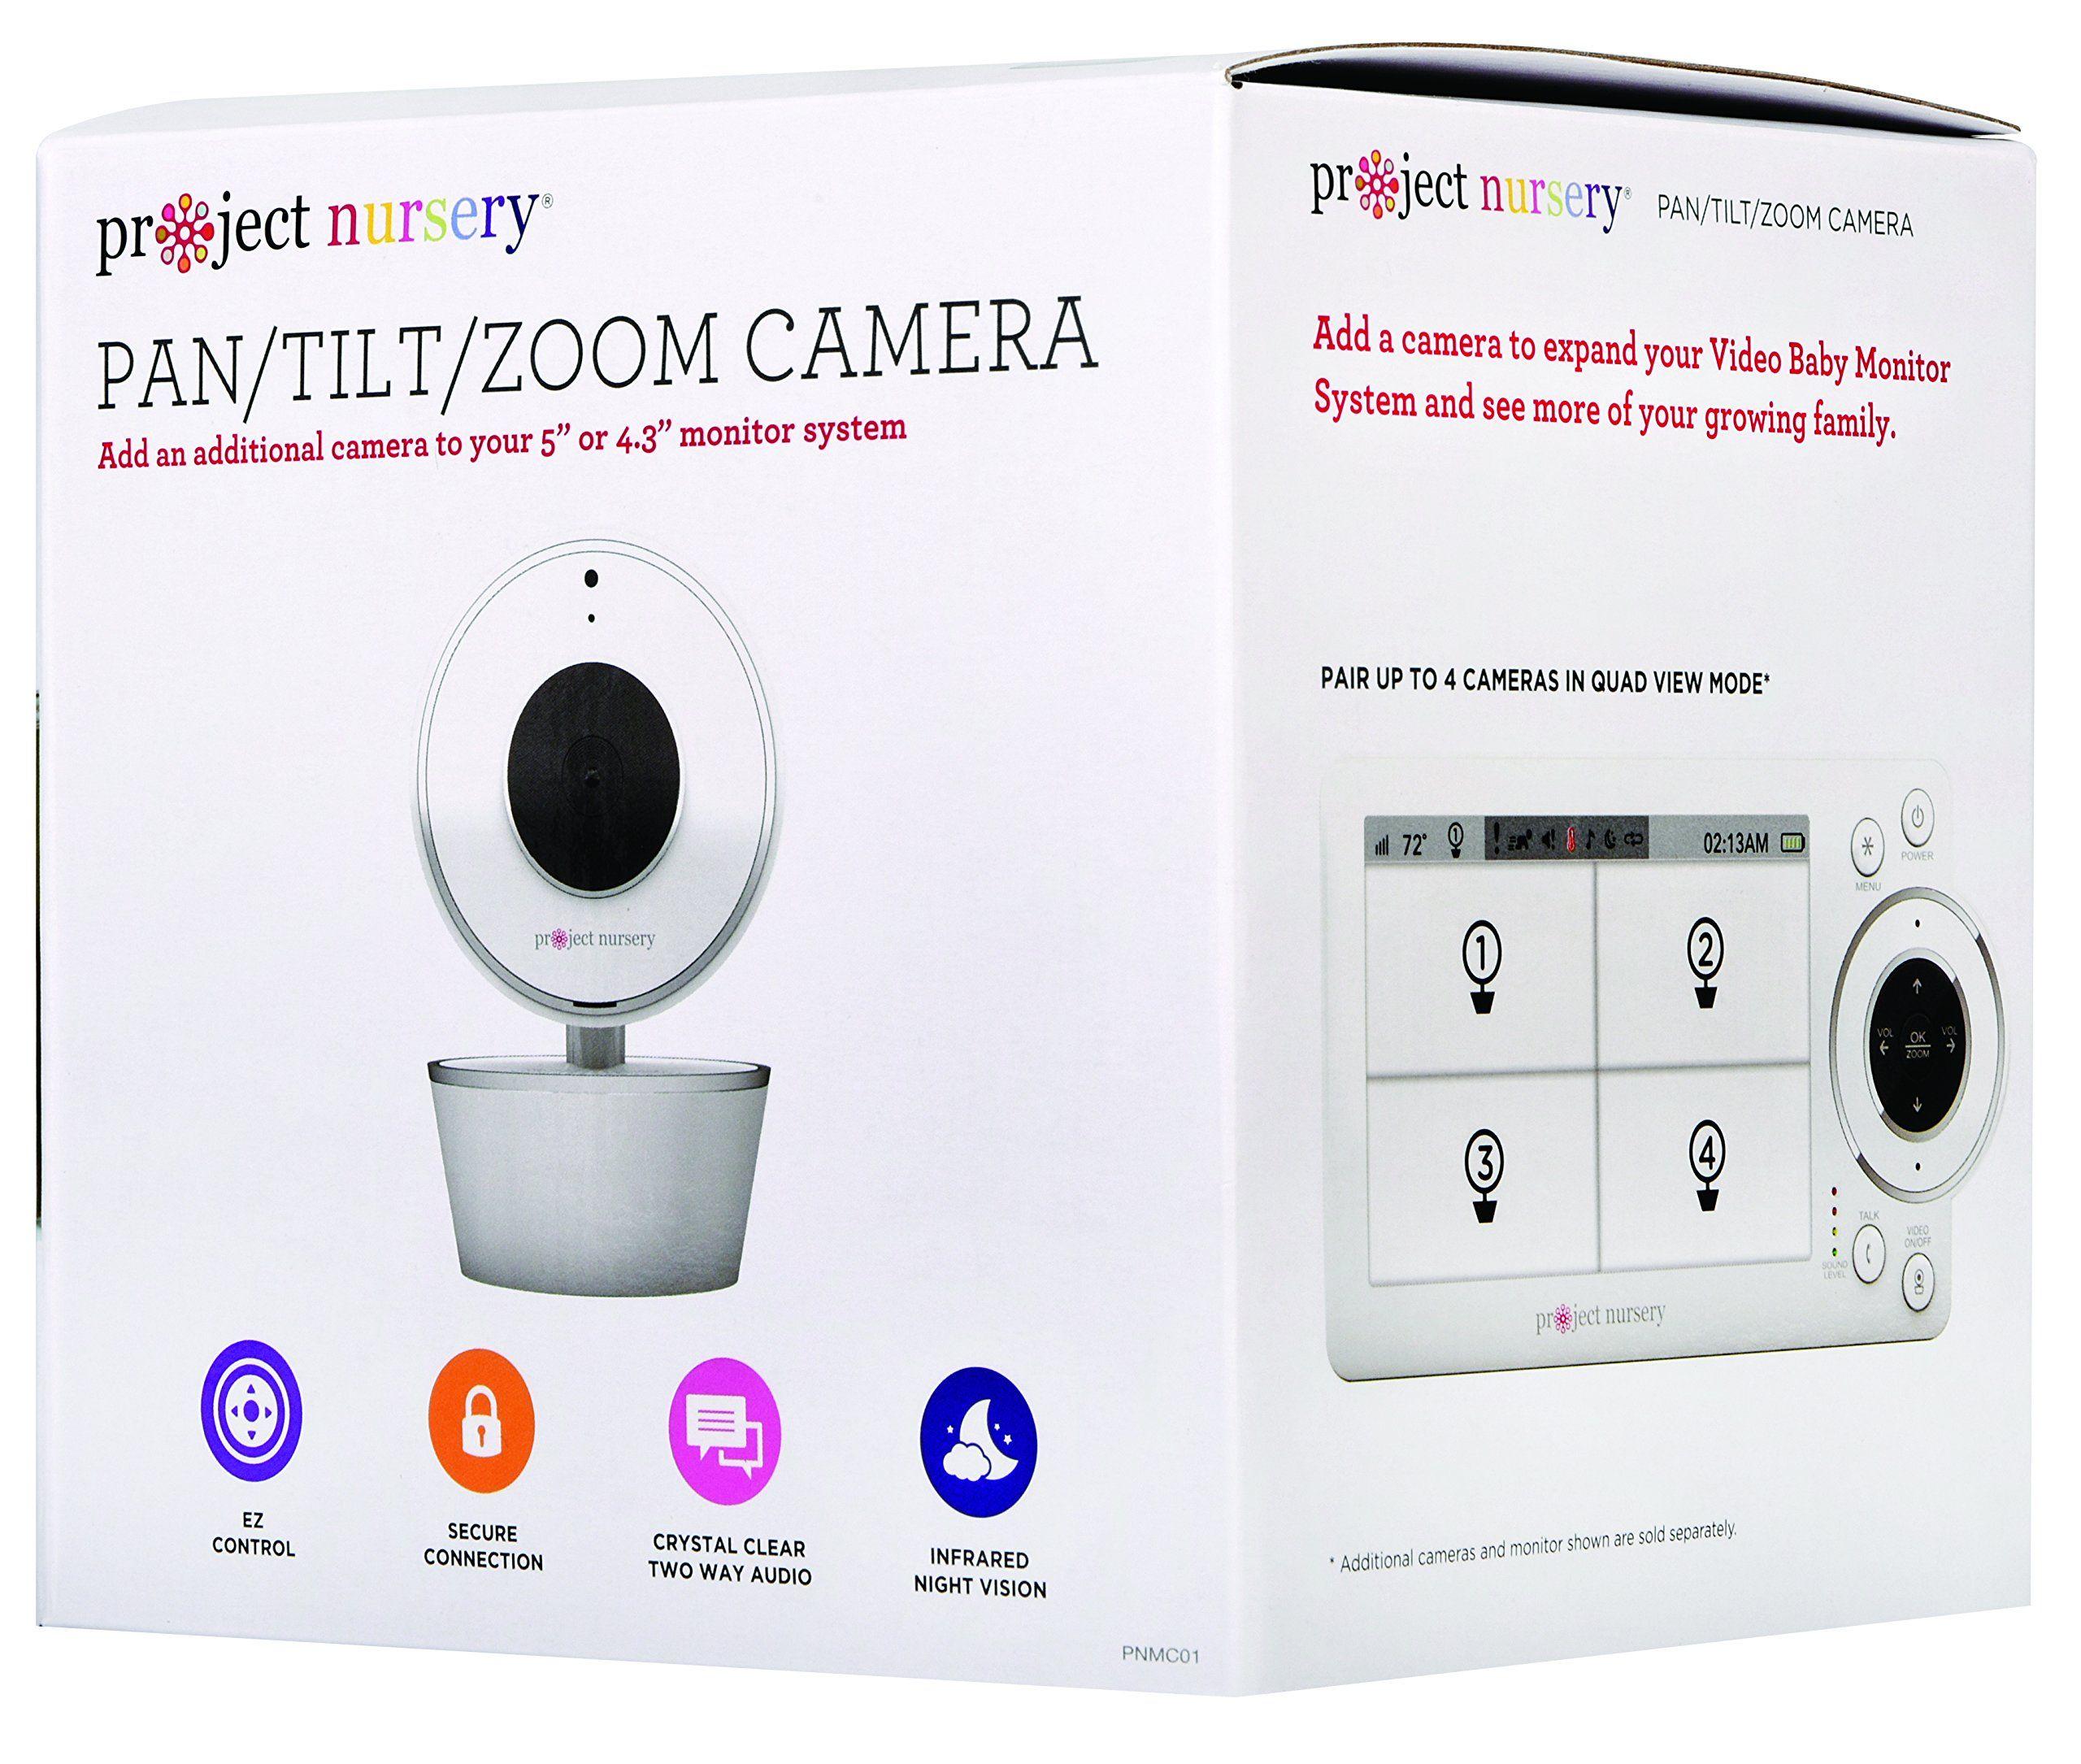 PNM4W01 PNM401 Project Nursery Accessory Pan//Tilt /& Zoom Camera for PNM5W01